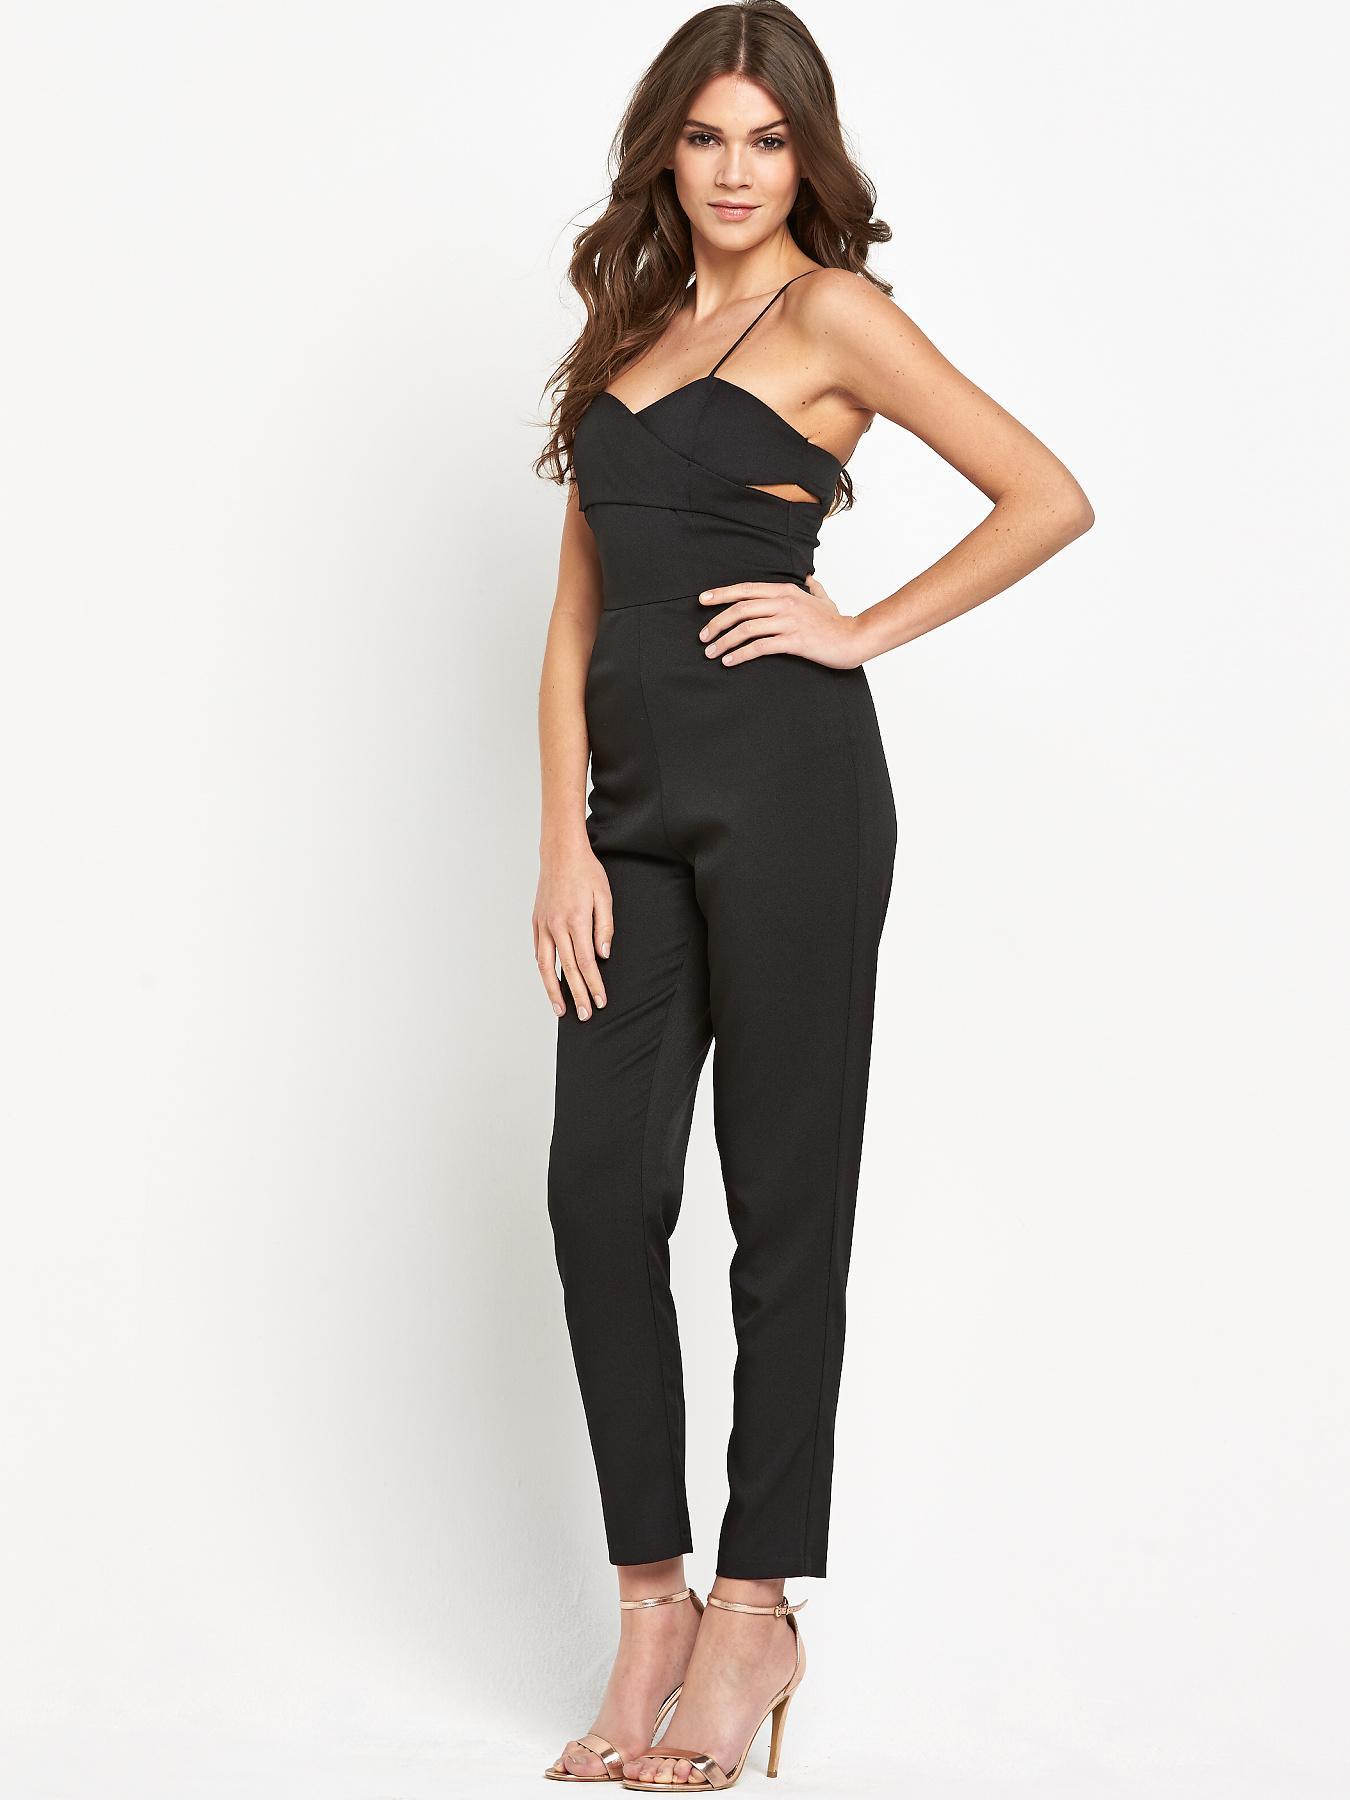 Lavish Alice Crossover Bralet Tapered Leg Jumpsuit - Black, Black